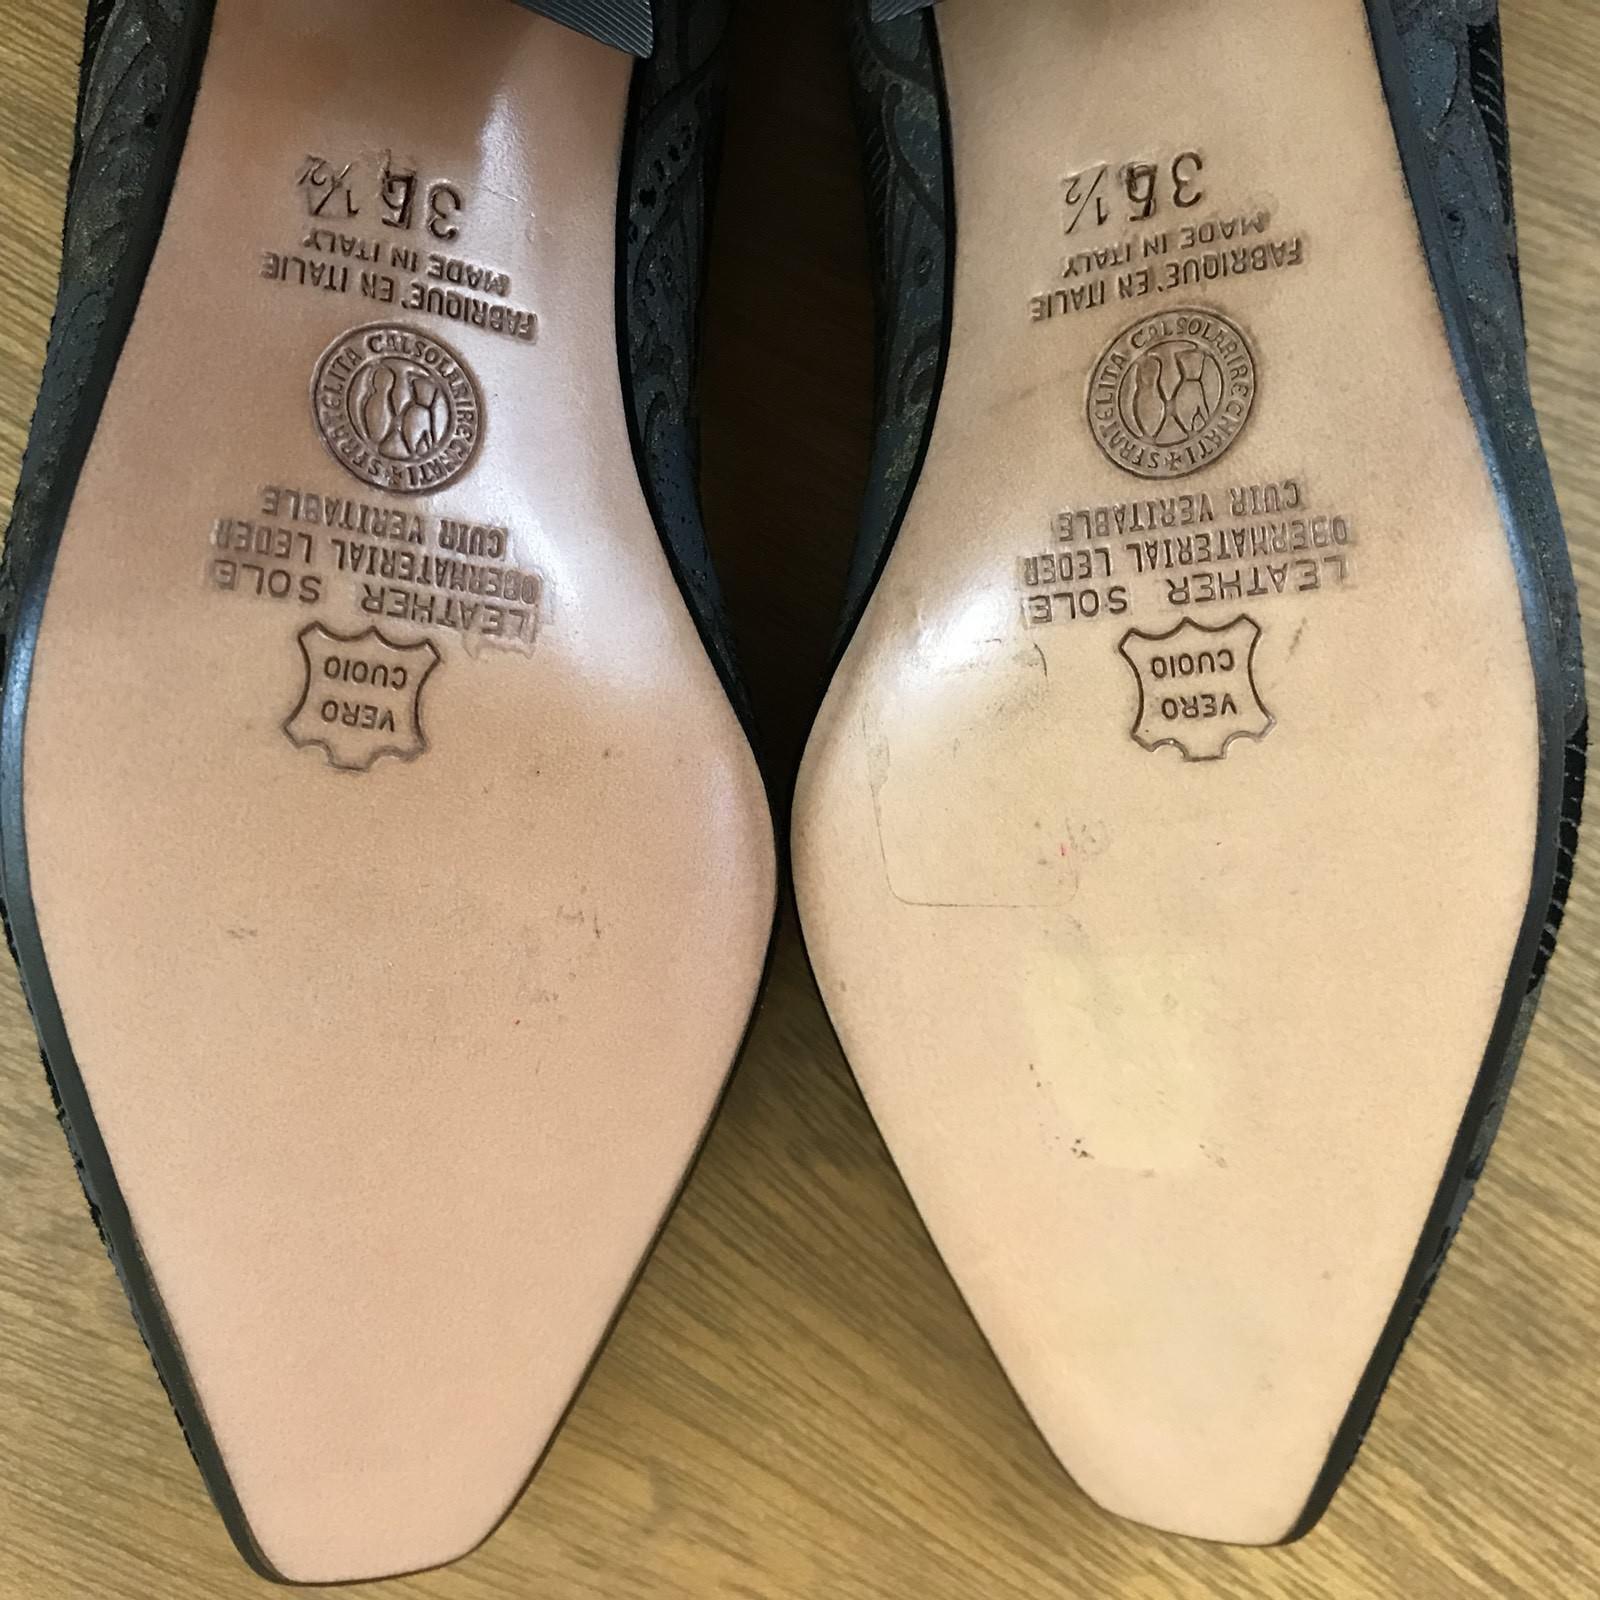 Serena D'Italia damen's Pumps Pumps damen's Kitten Heel Paisley Pattern US Größe 4.5 Made  80f458